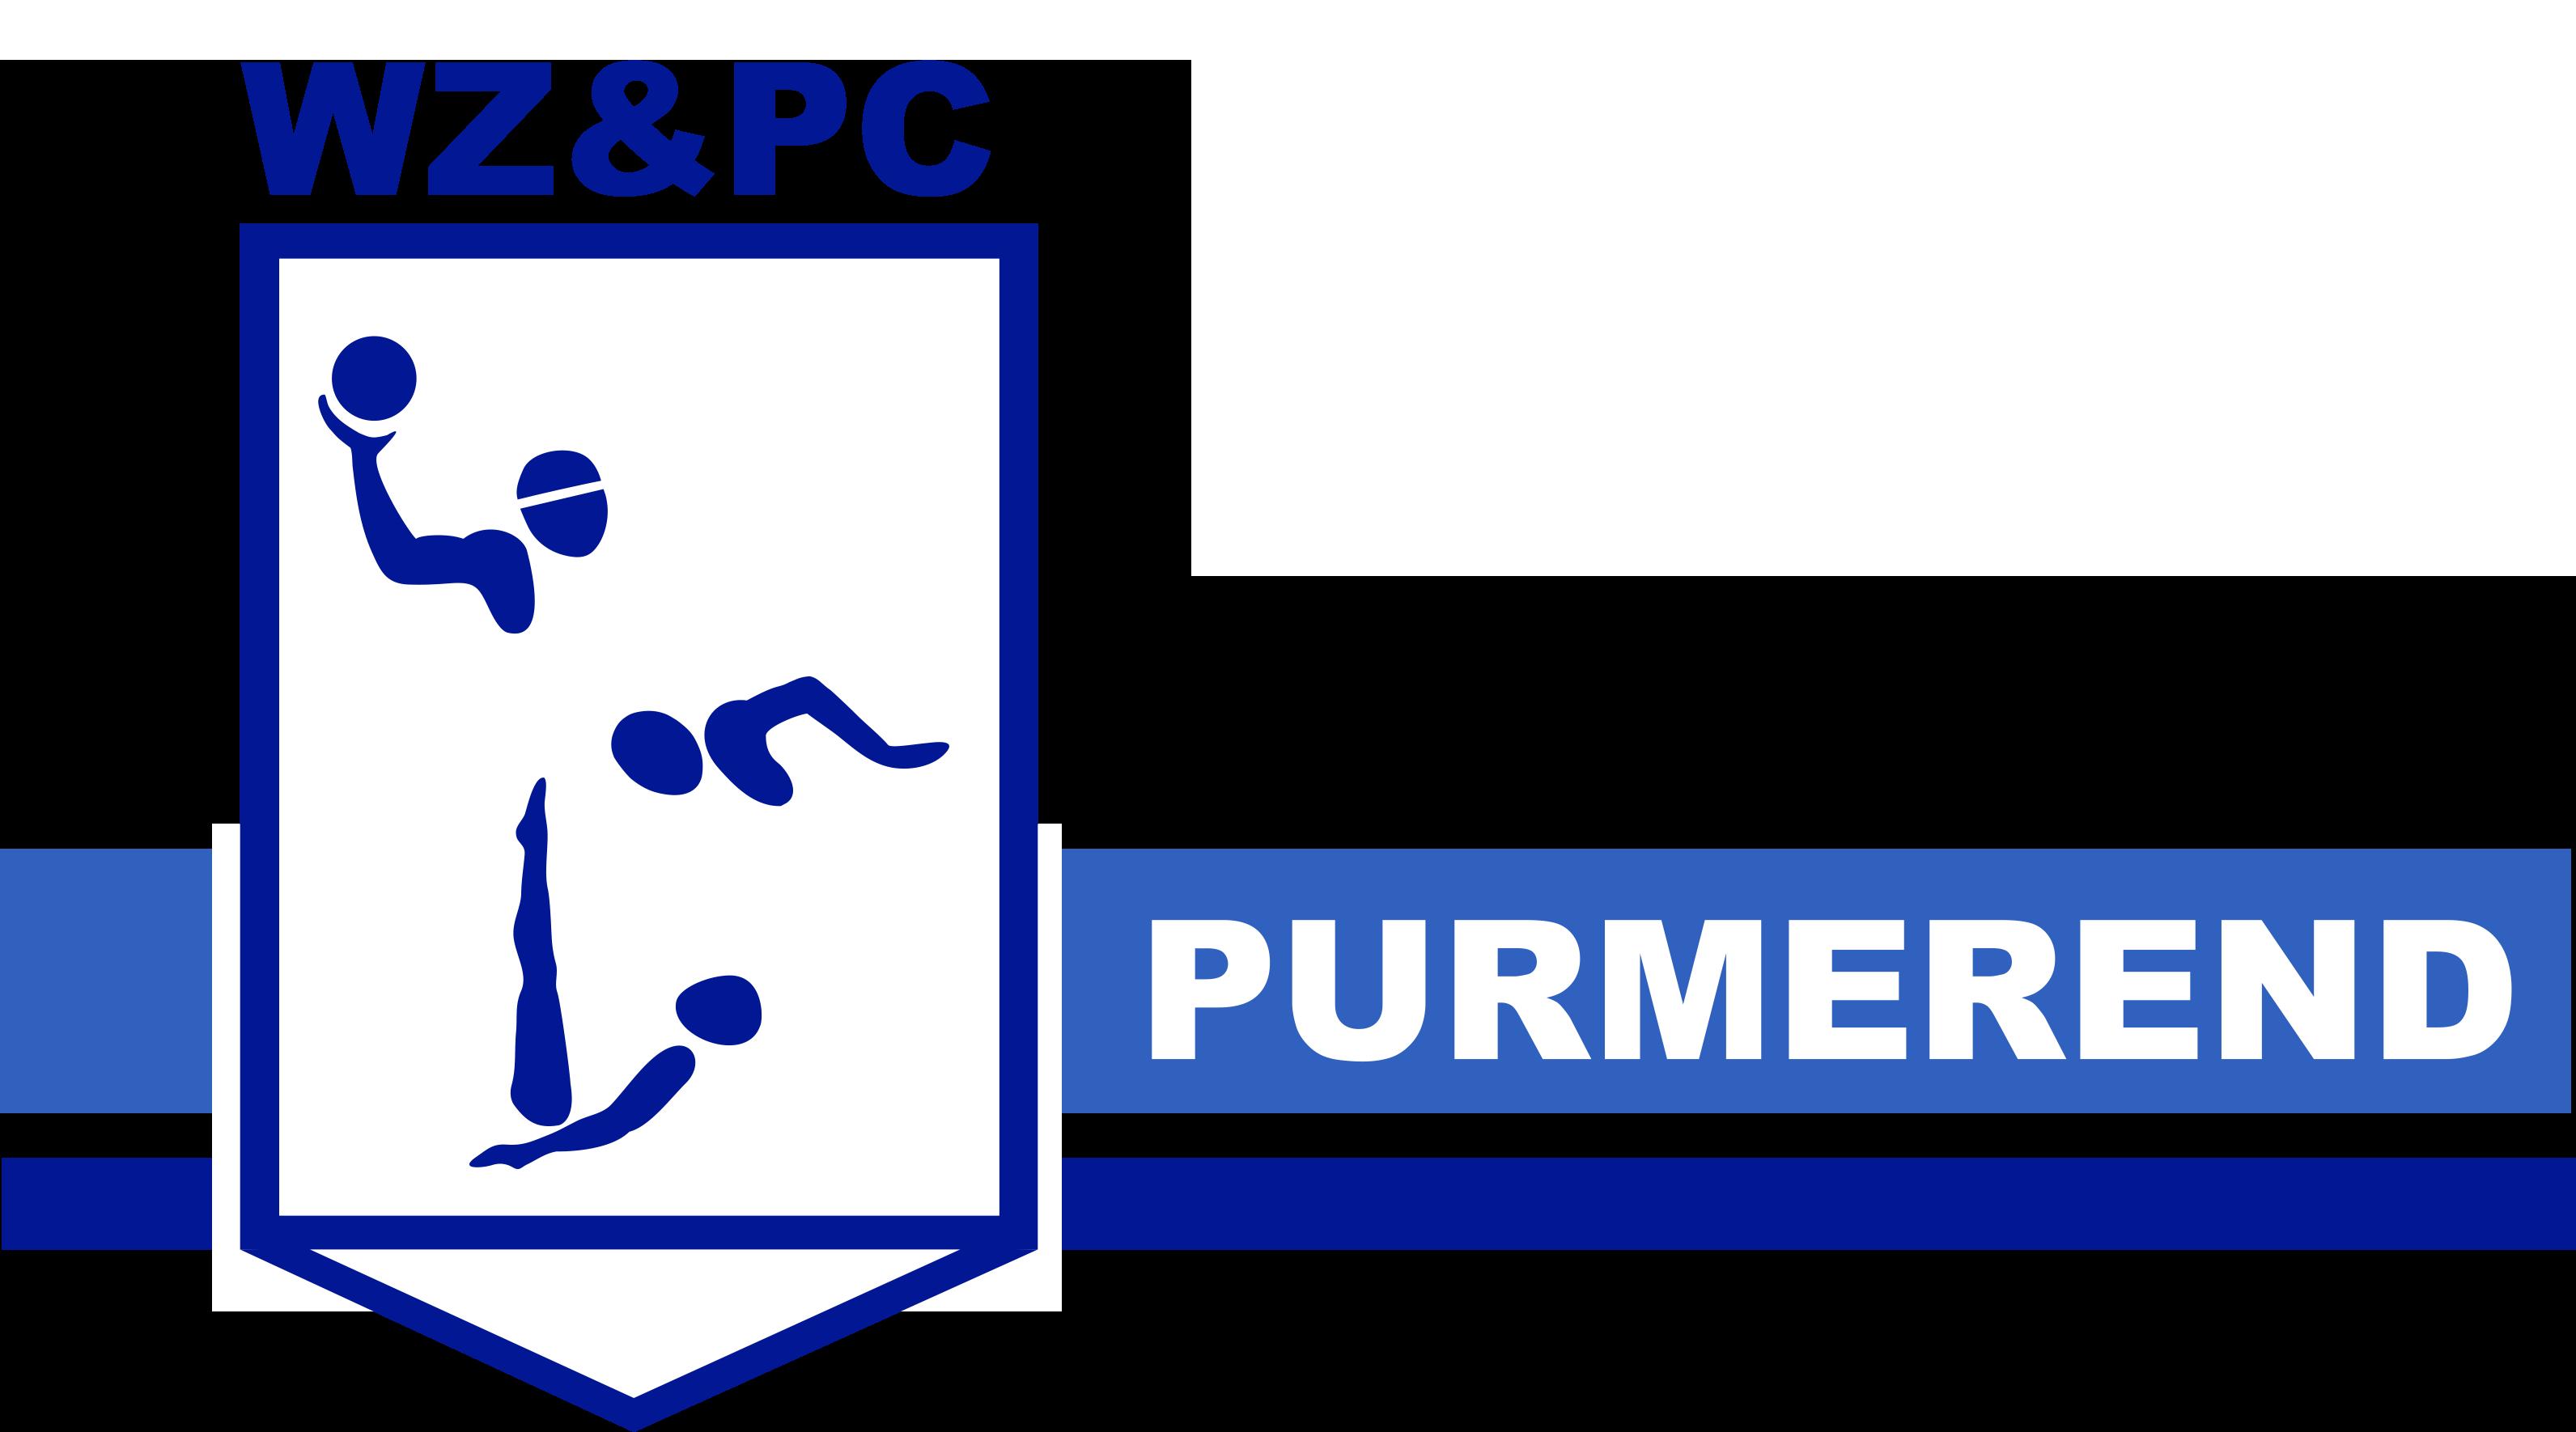 https://wzpc.nl/wp-content/uploads/2019/09/Logo_WZPC.png